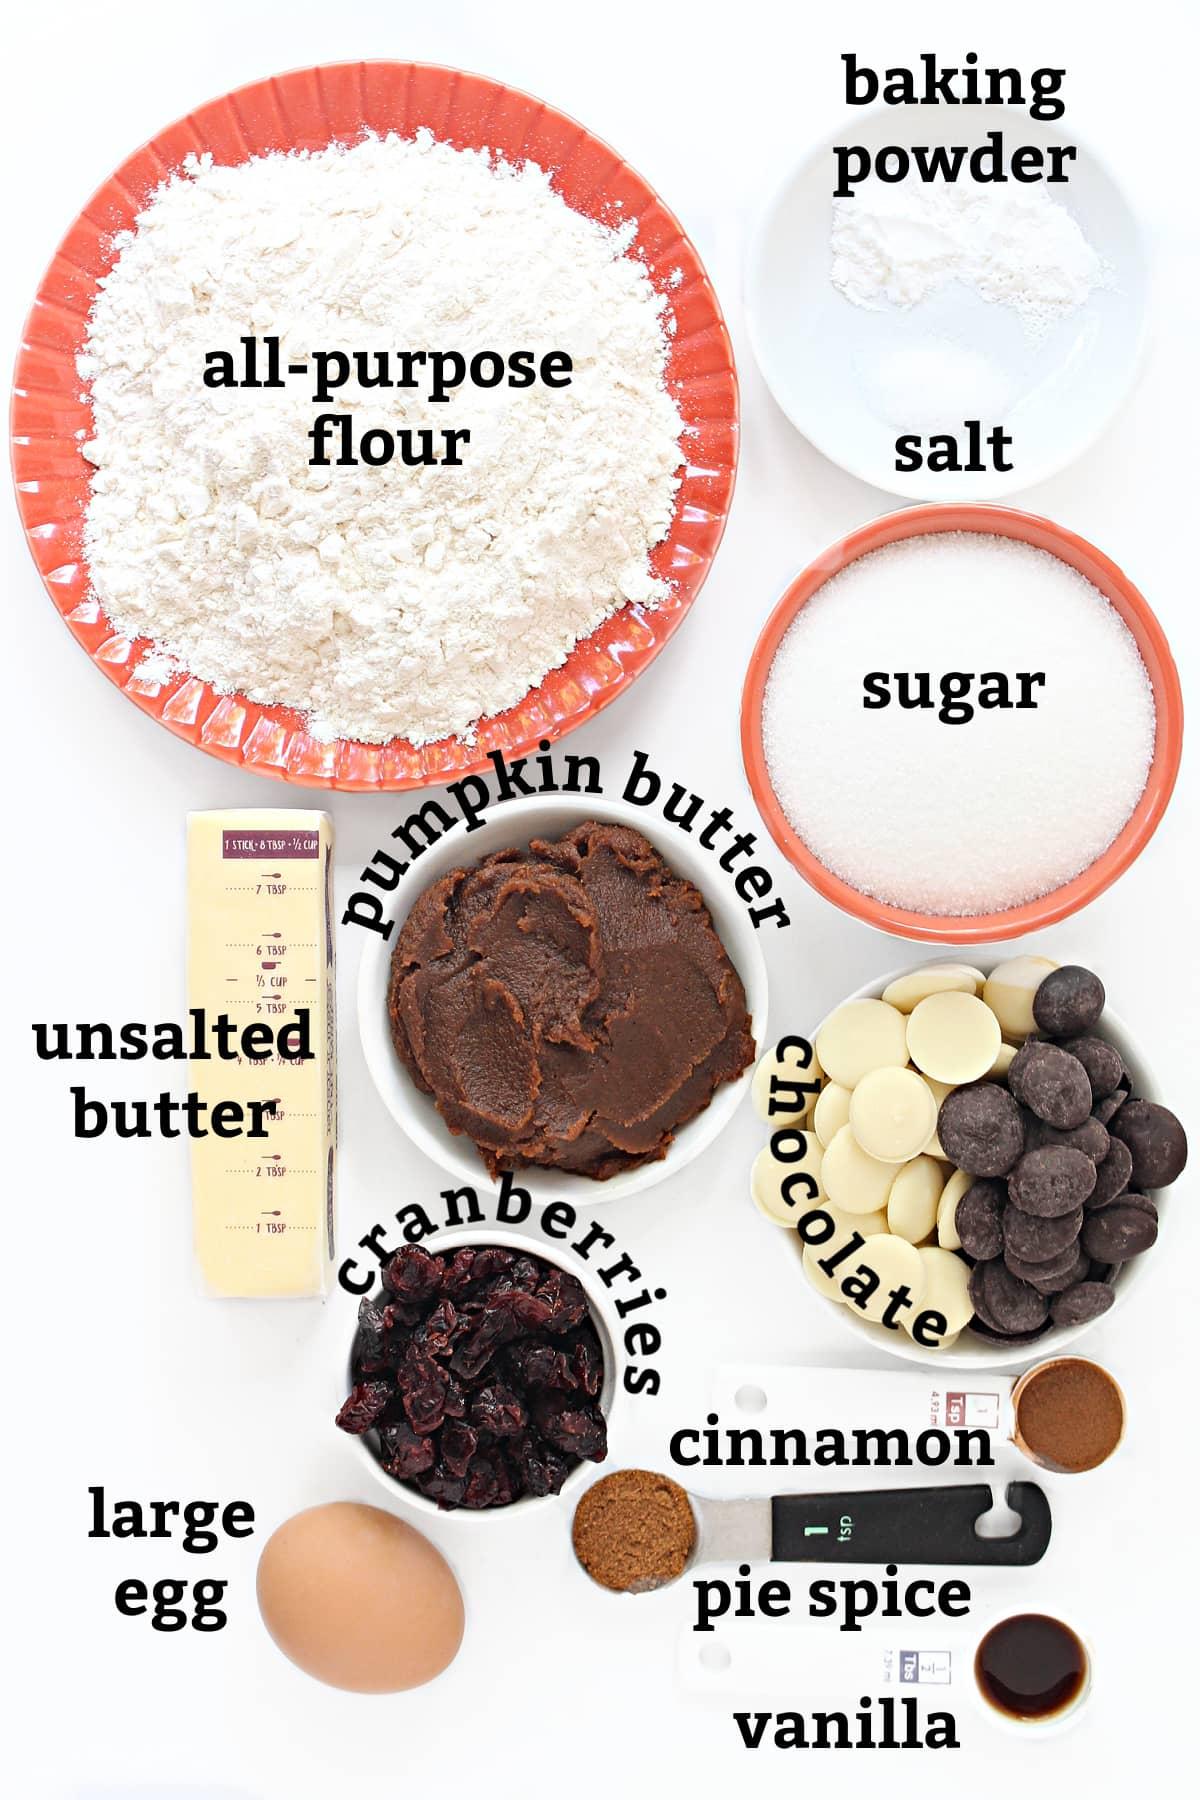 Biscotti ingredients; flour, salt, sugar, pumpkin butter, butter, cranberries, egg, cinnamon, pumpkin spice, vanilla, melting chocolate.